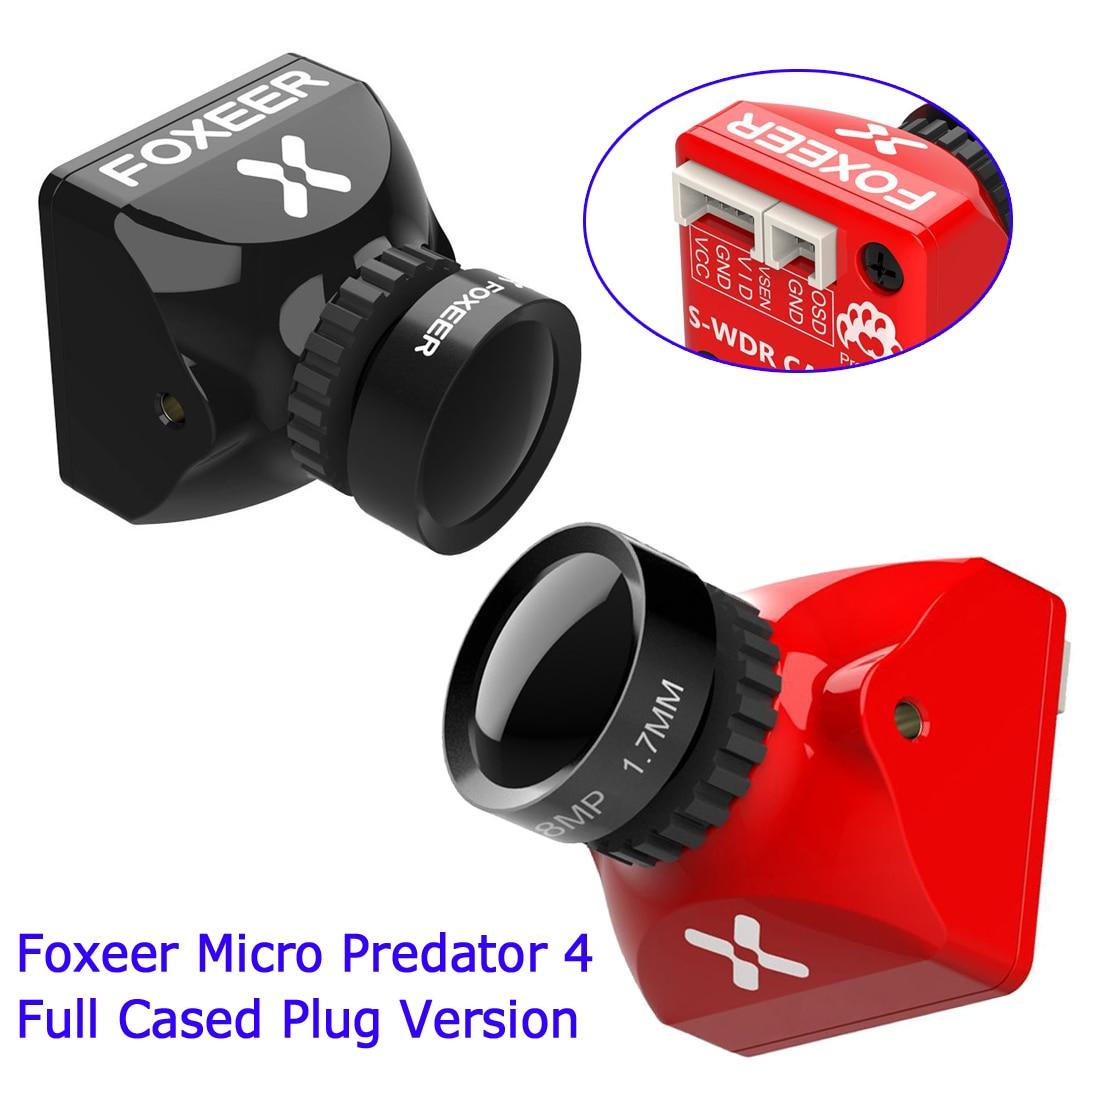 Foxeer Micro Predator 4, cámara completa con cubierta M8 4ms, Super WDR de latencia 1000TVL CMOS 1,7mm, lente con OSD para RC FPV, Dron mondadientes